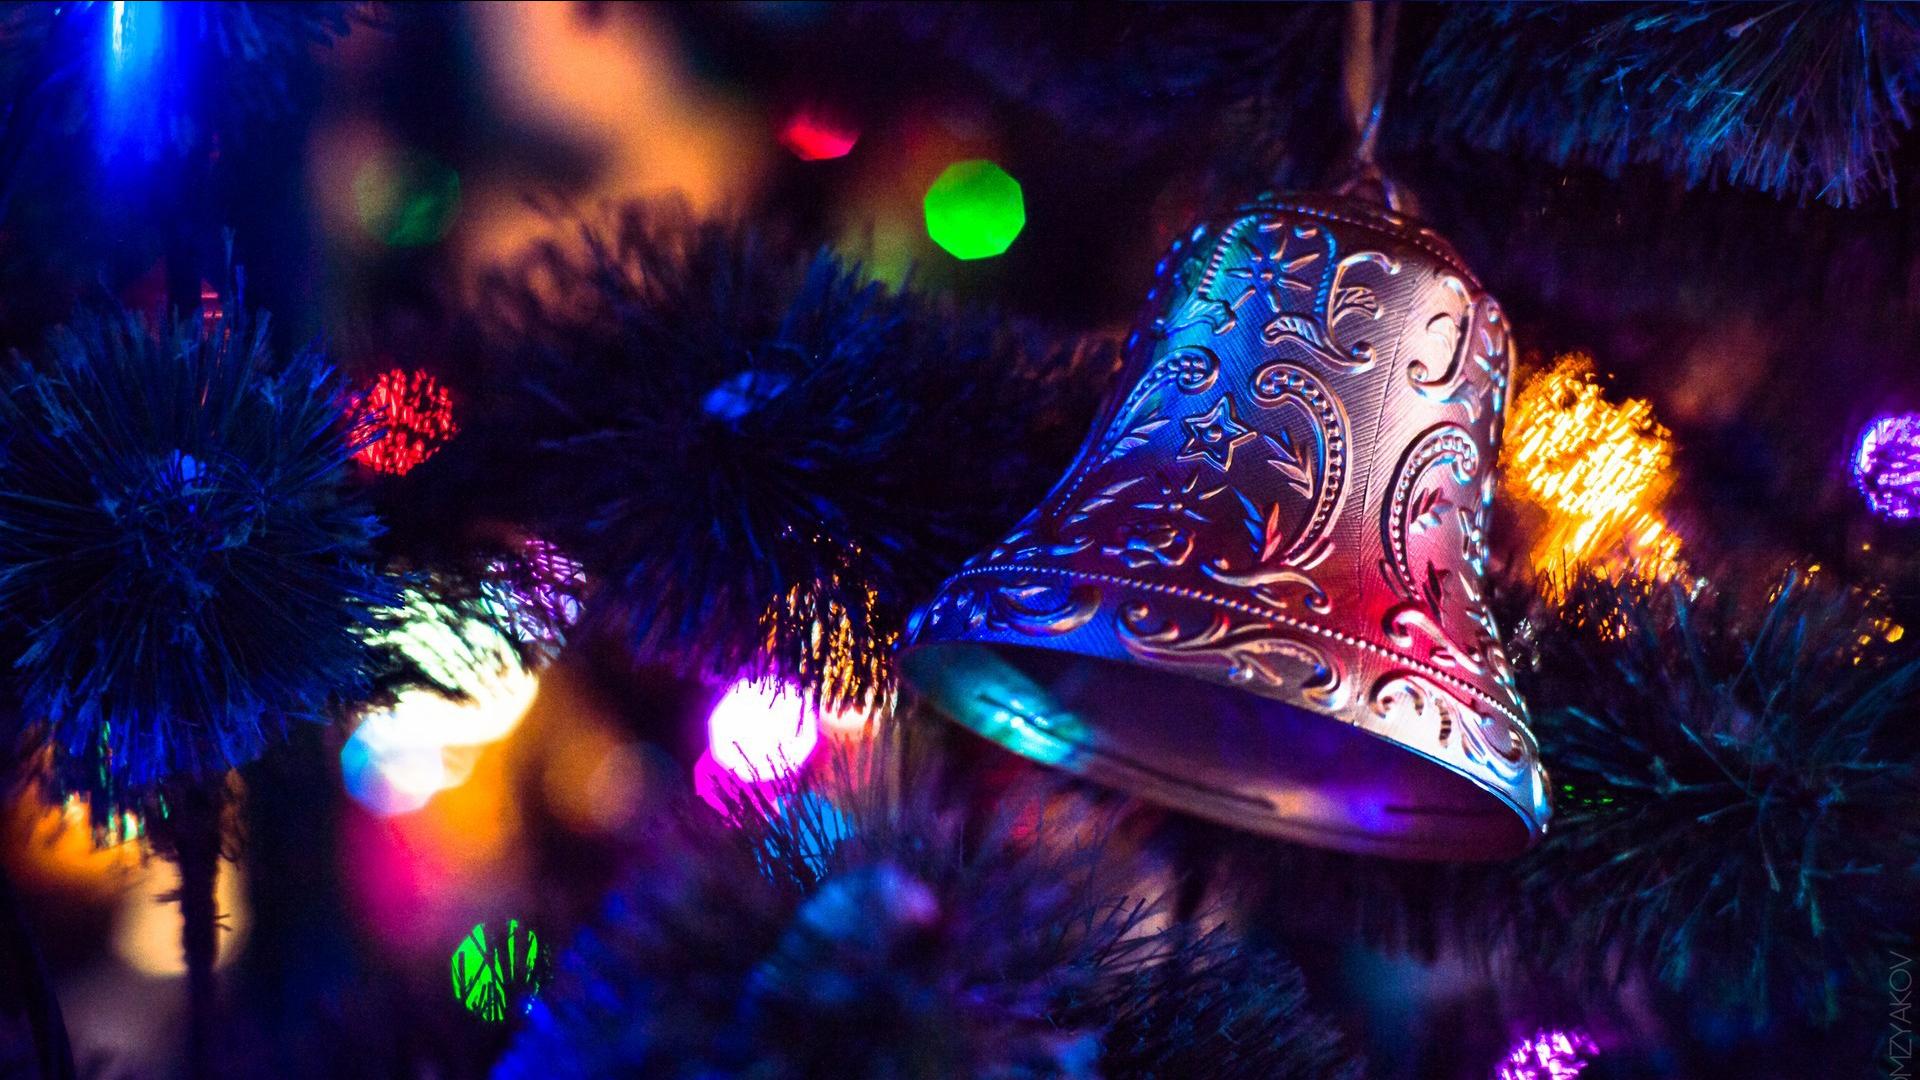 Christmas Backgrounds Best for Kodi 5